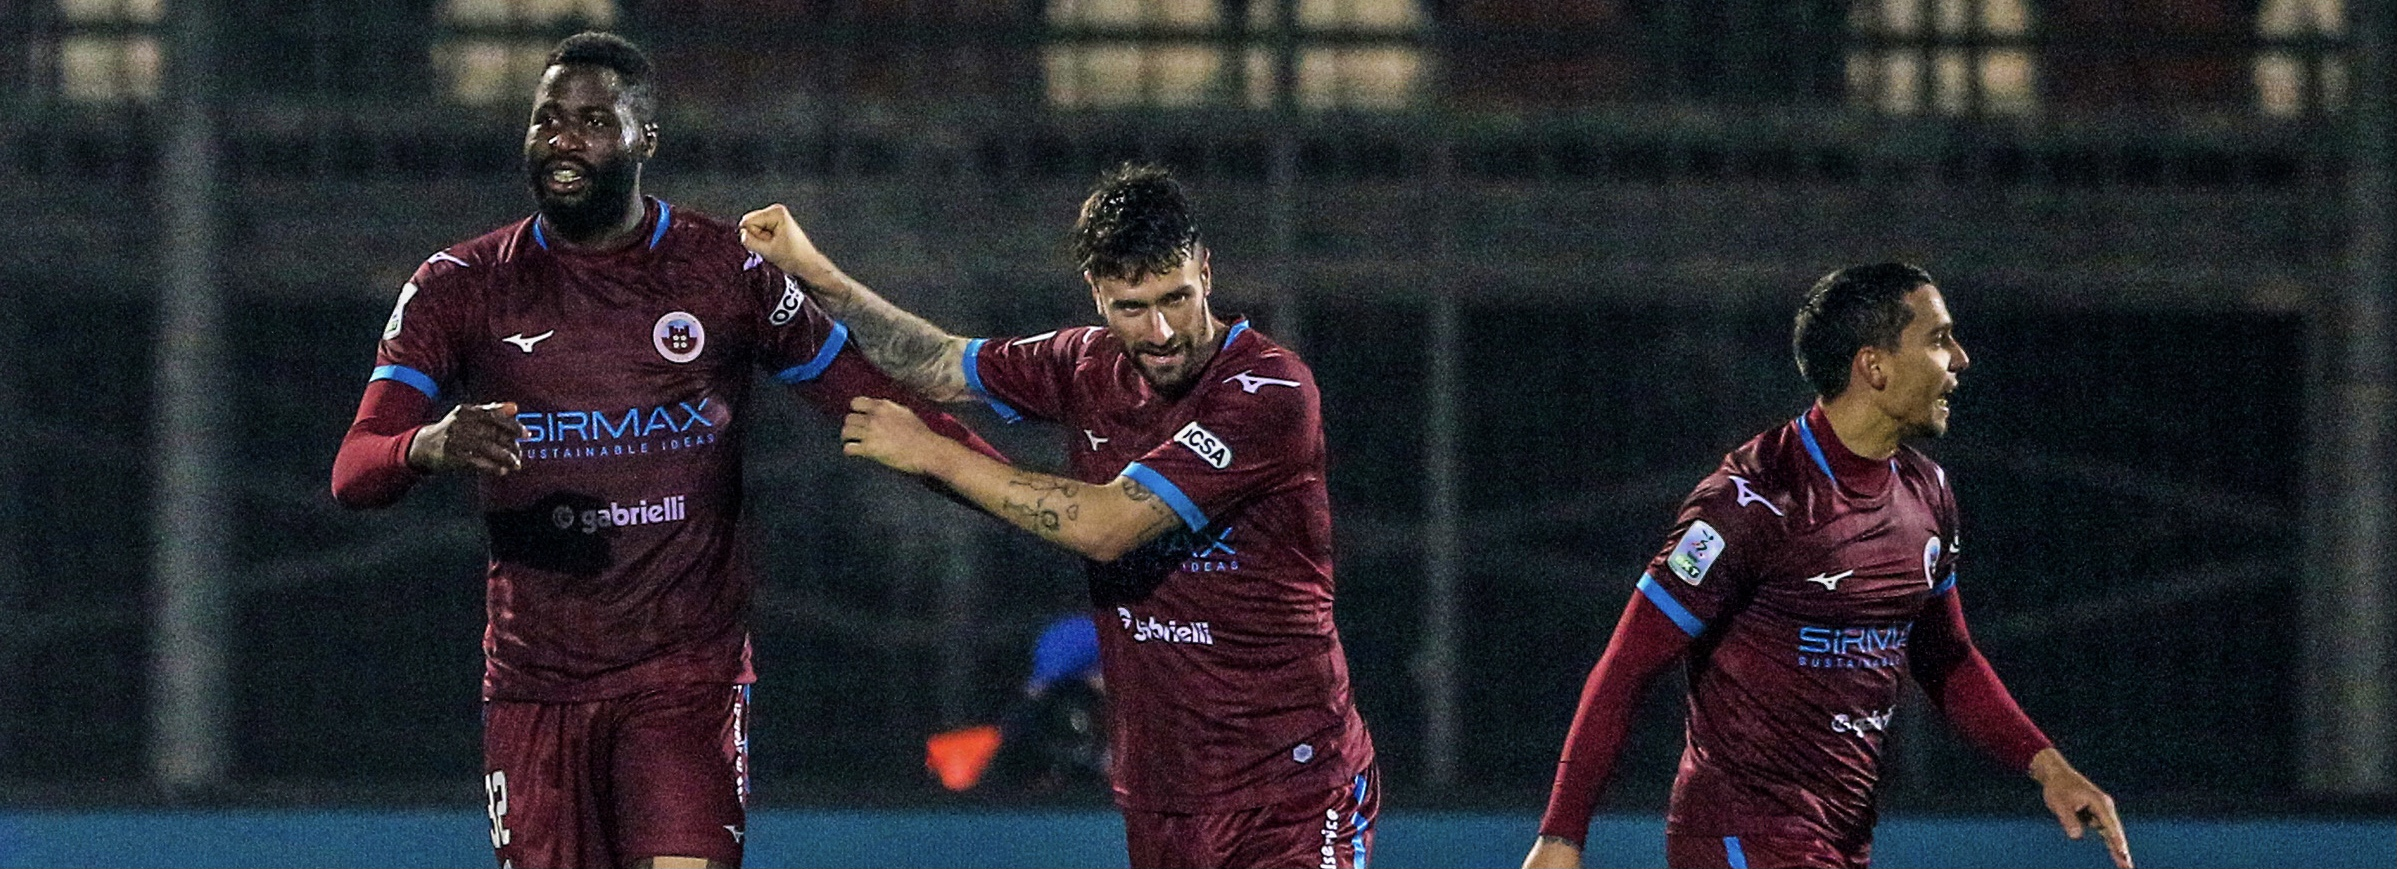 Cittadella – Frosinone 1 – 0